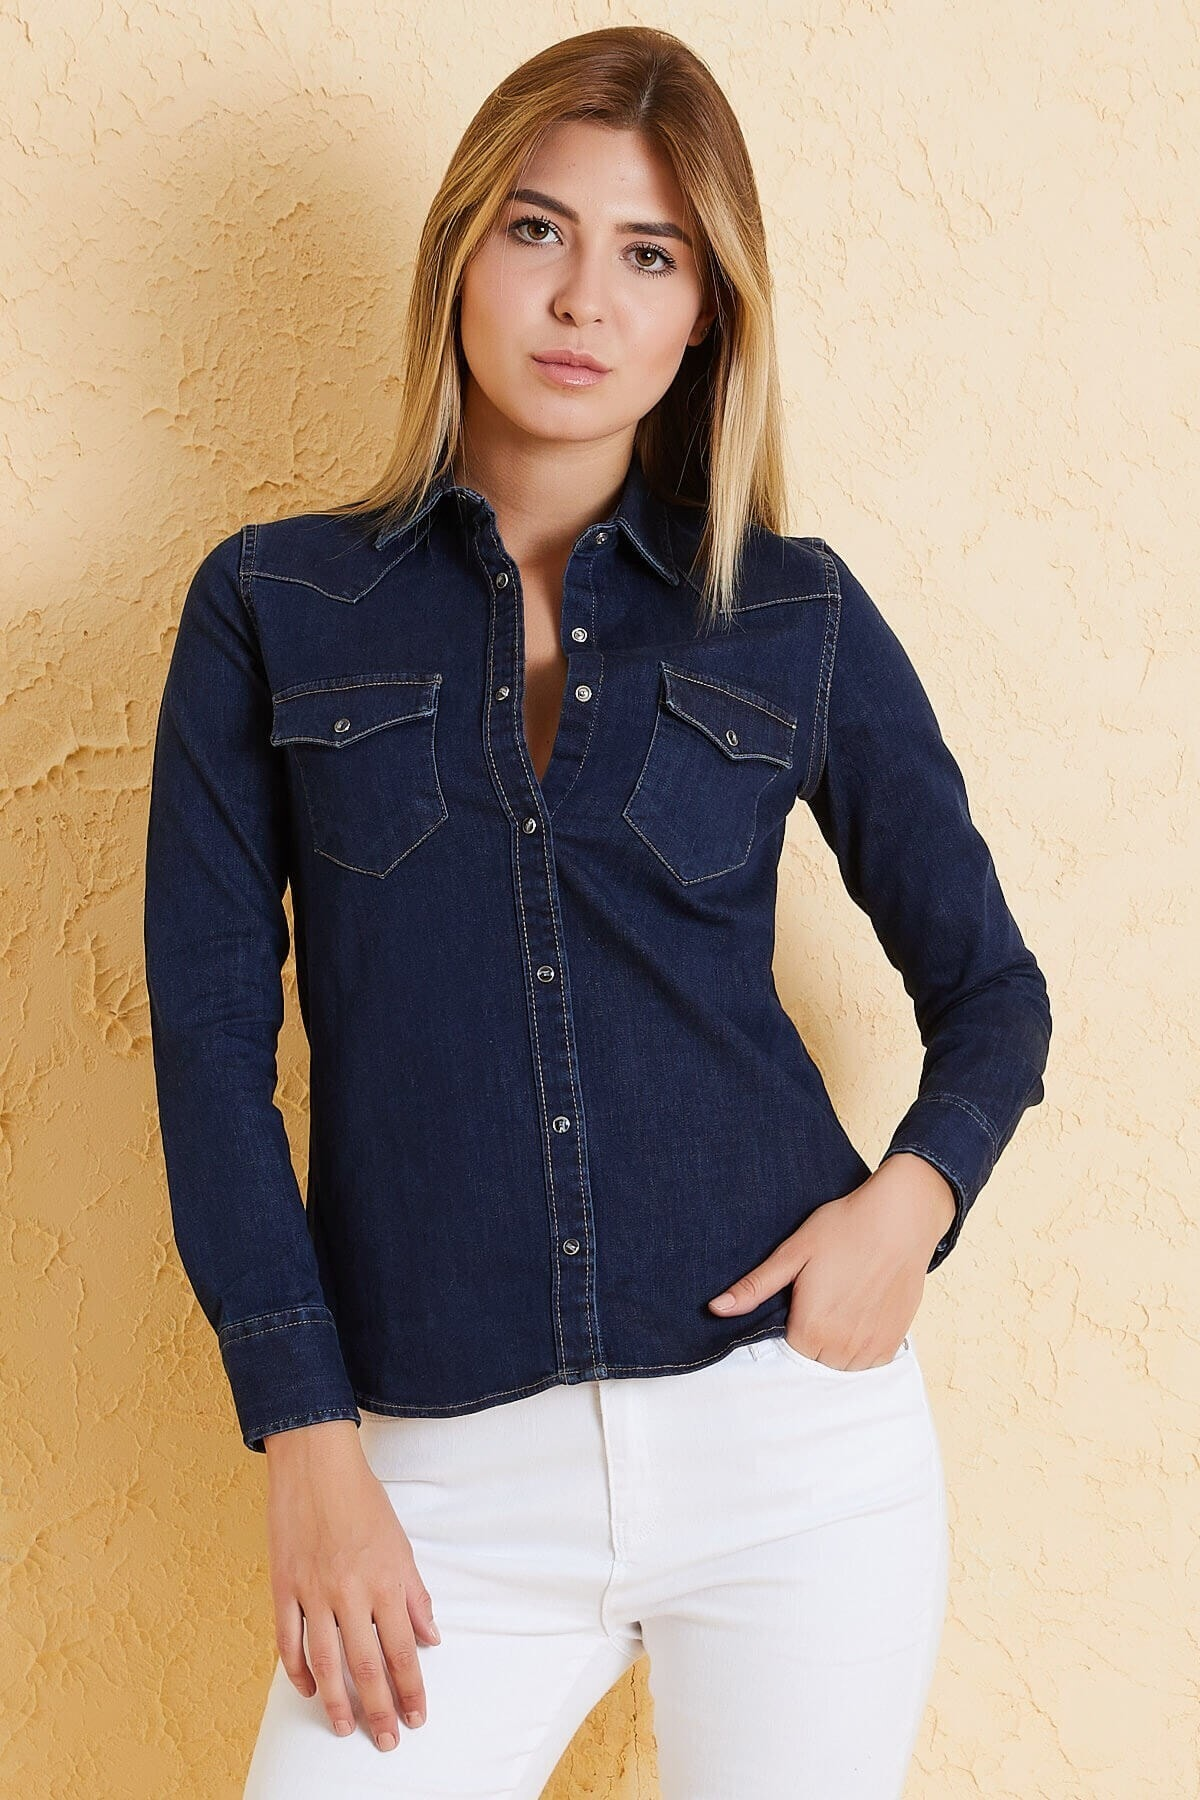 Twister Jeans Kadın Slim Fit Gömlek Bg 812-02 Lacivert 1